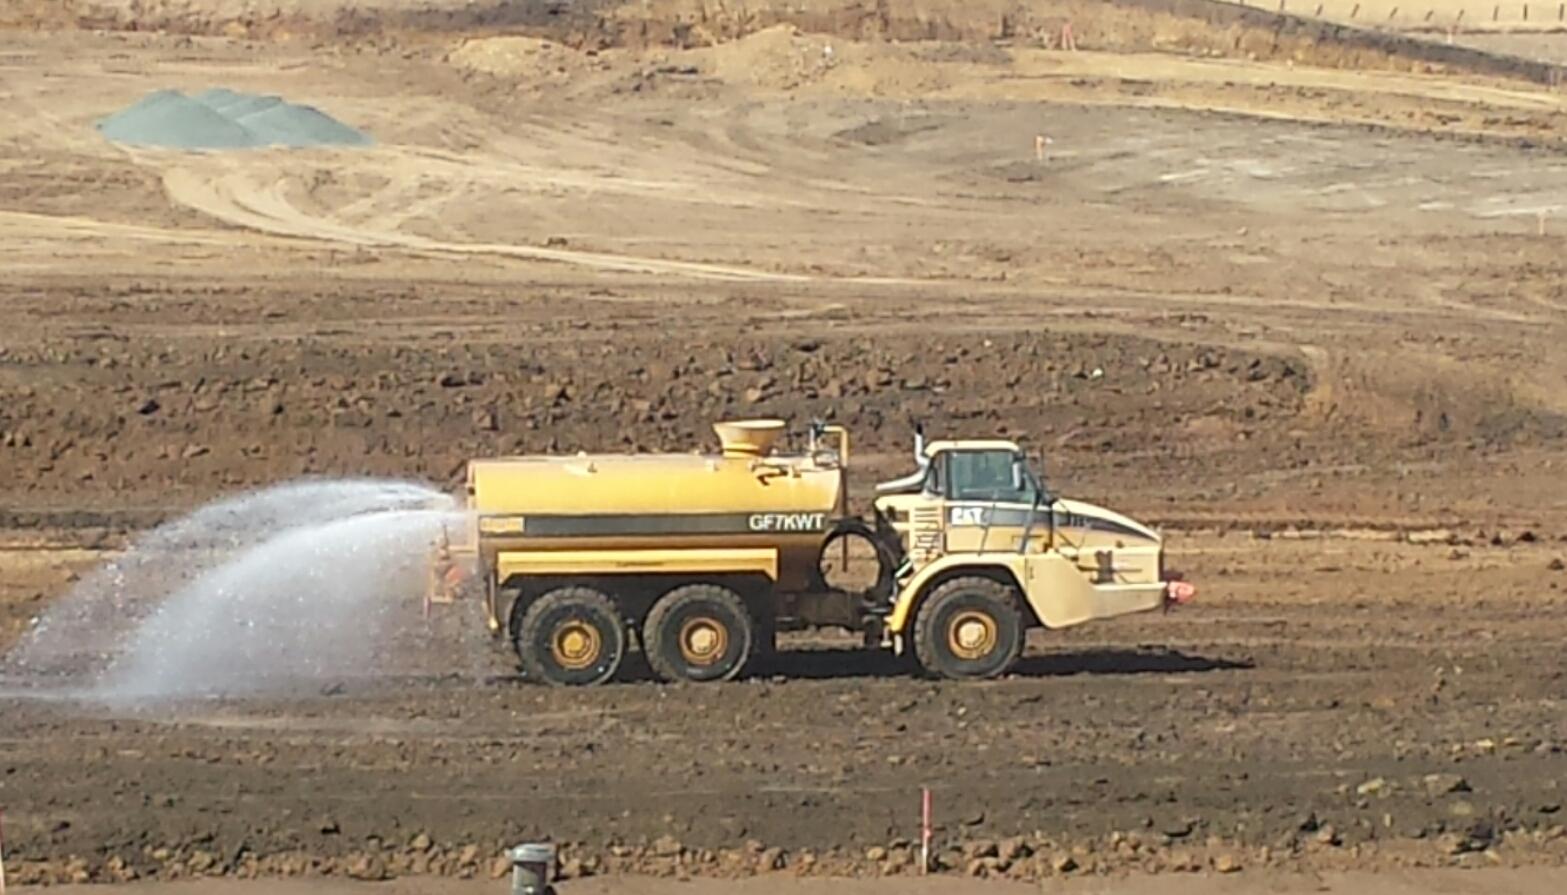 7,000 Gallon Water Truck, 735